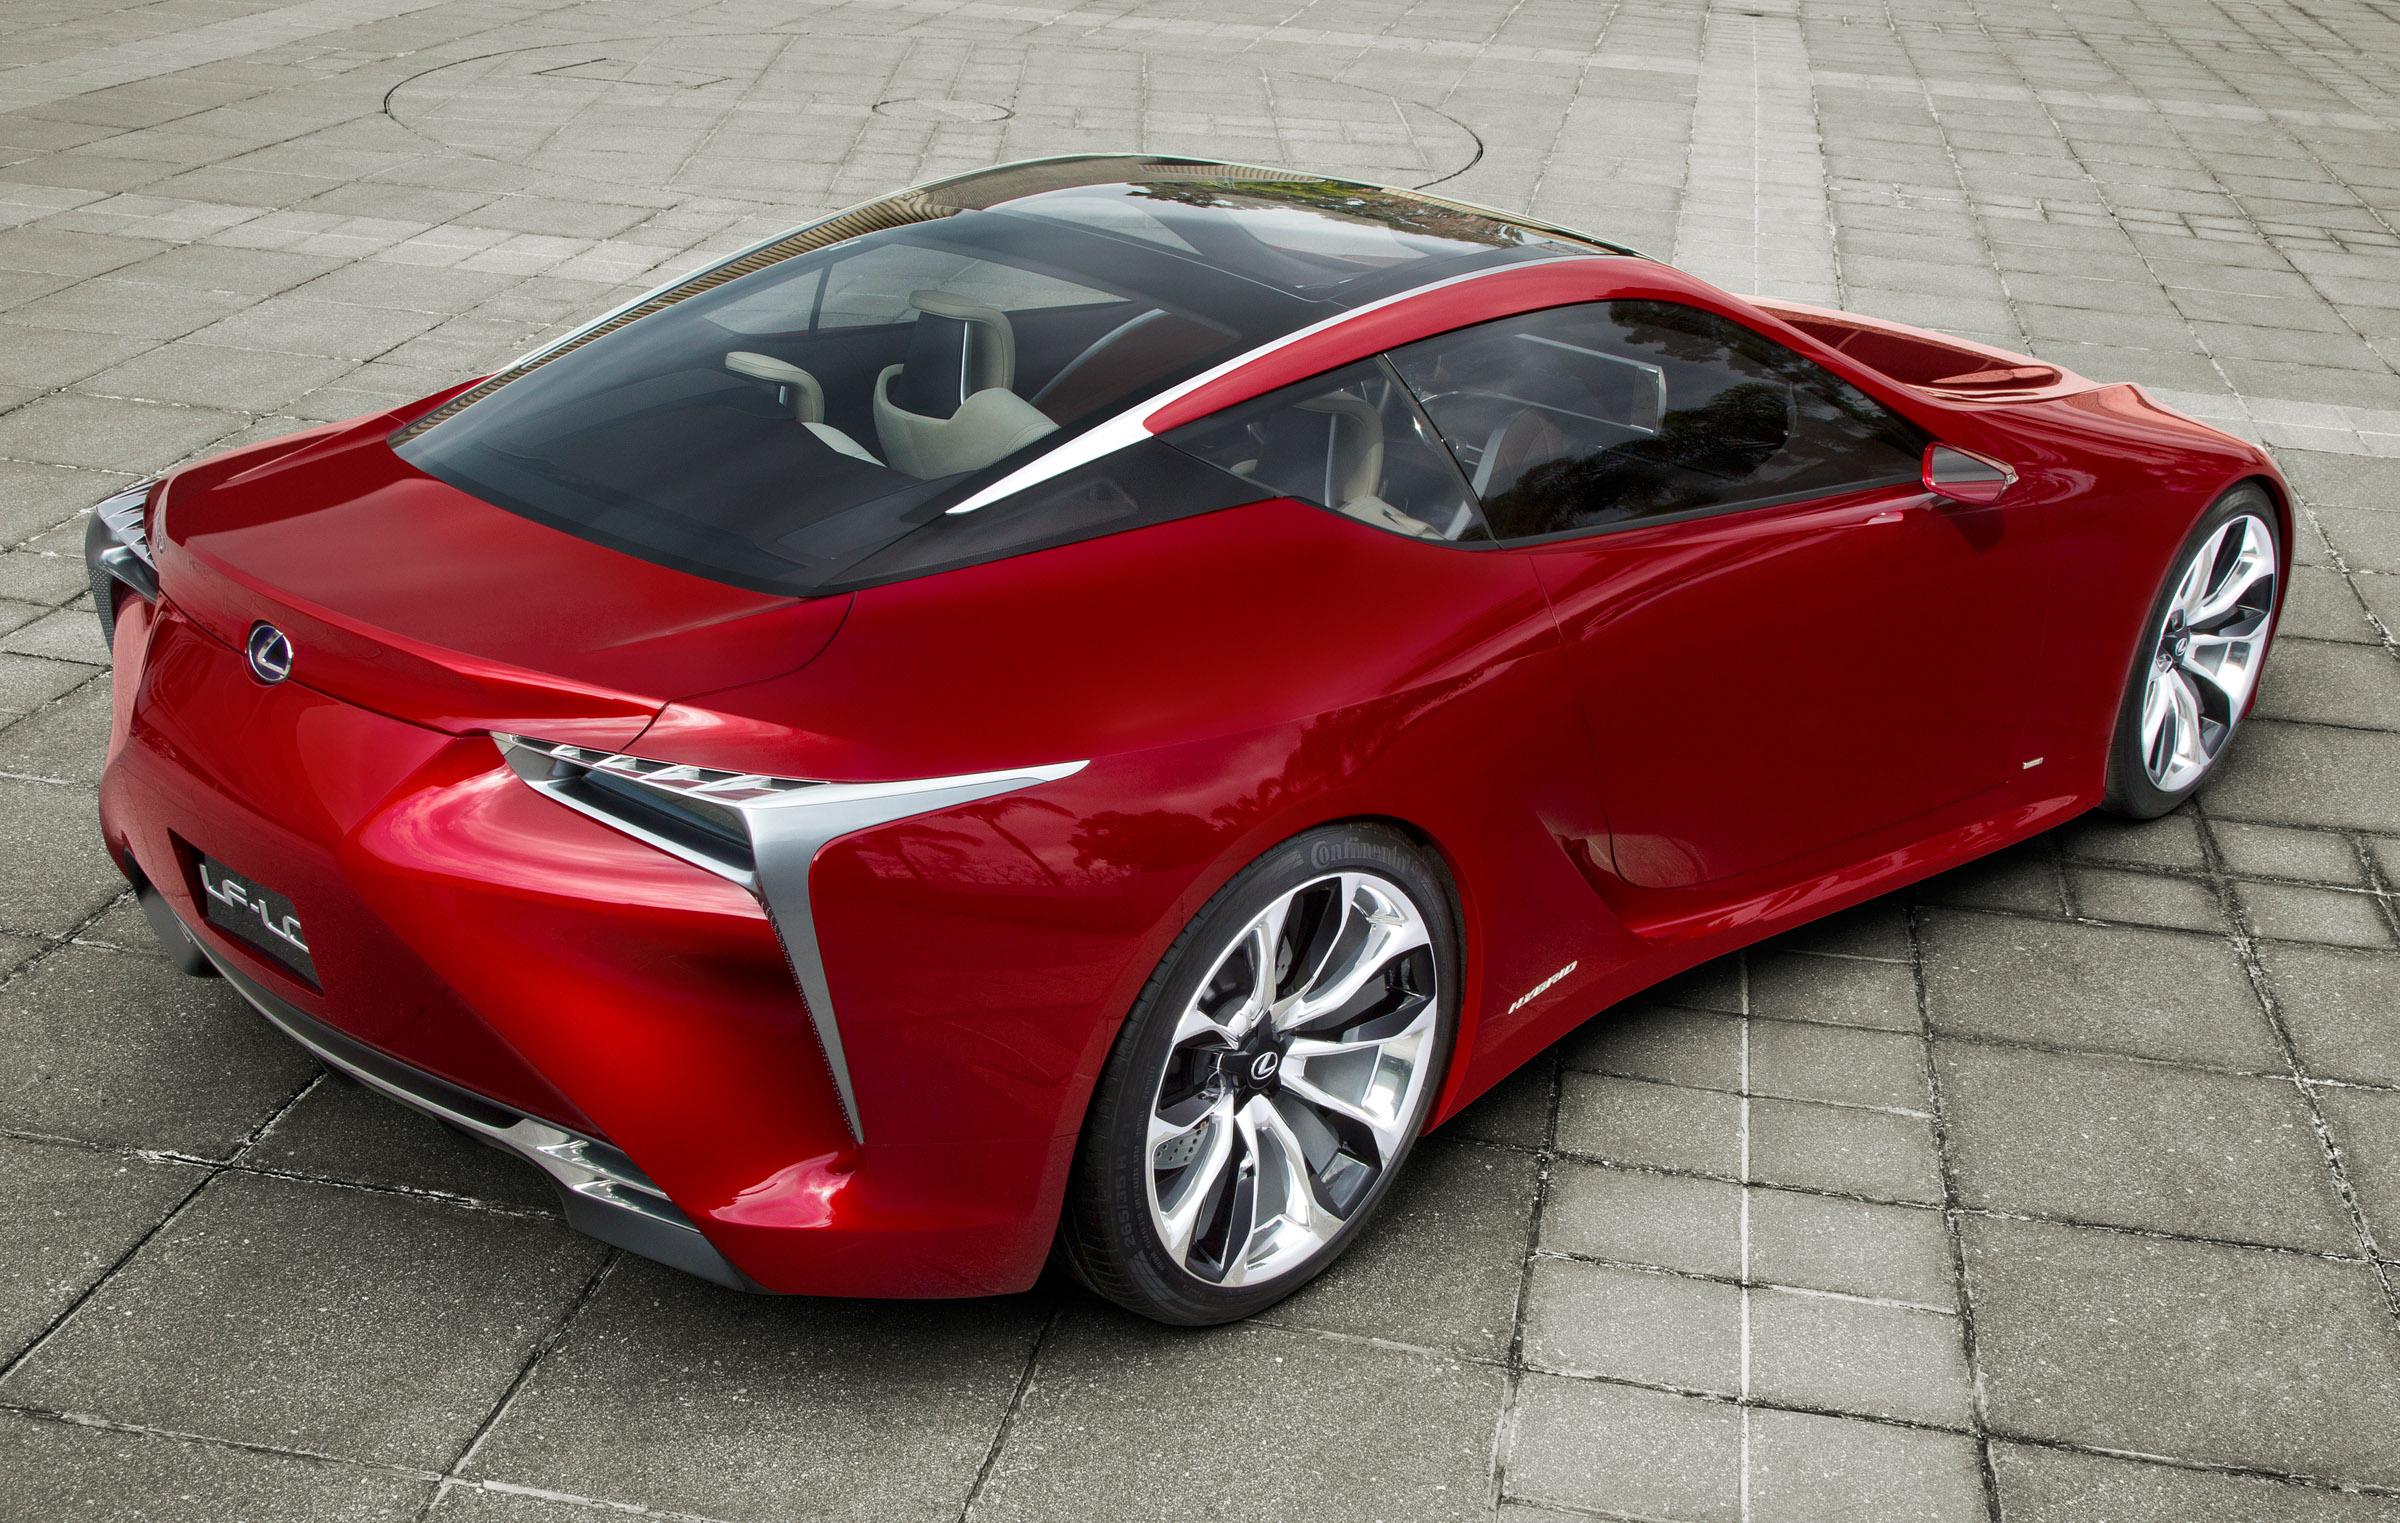 https://www.automobilesreview.com/gallery/2012-lexus-lf-lc-sport-coupe-concept/2012-lexus-lf-lc-sport-coupe-concept-16.jpg